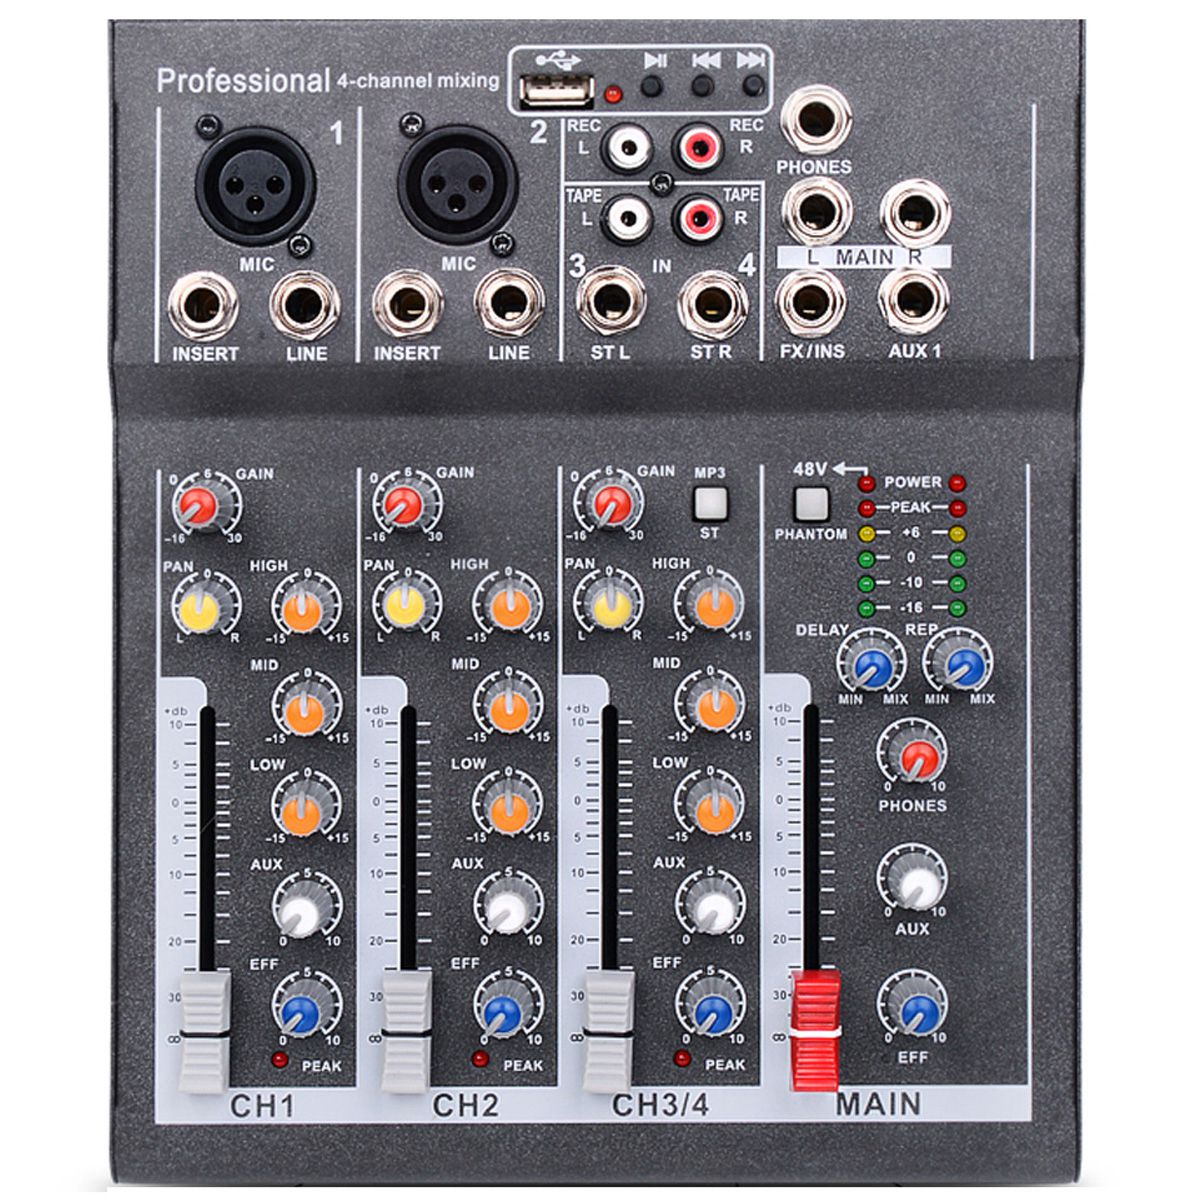 Eu Plug Mini Portable Audio Mixer With Usb Dj Sound Mixing Console Mp3 Jack 4 Channel